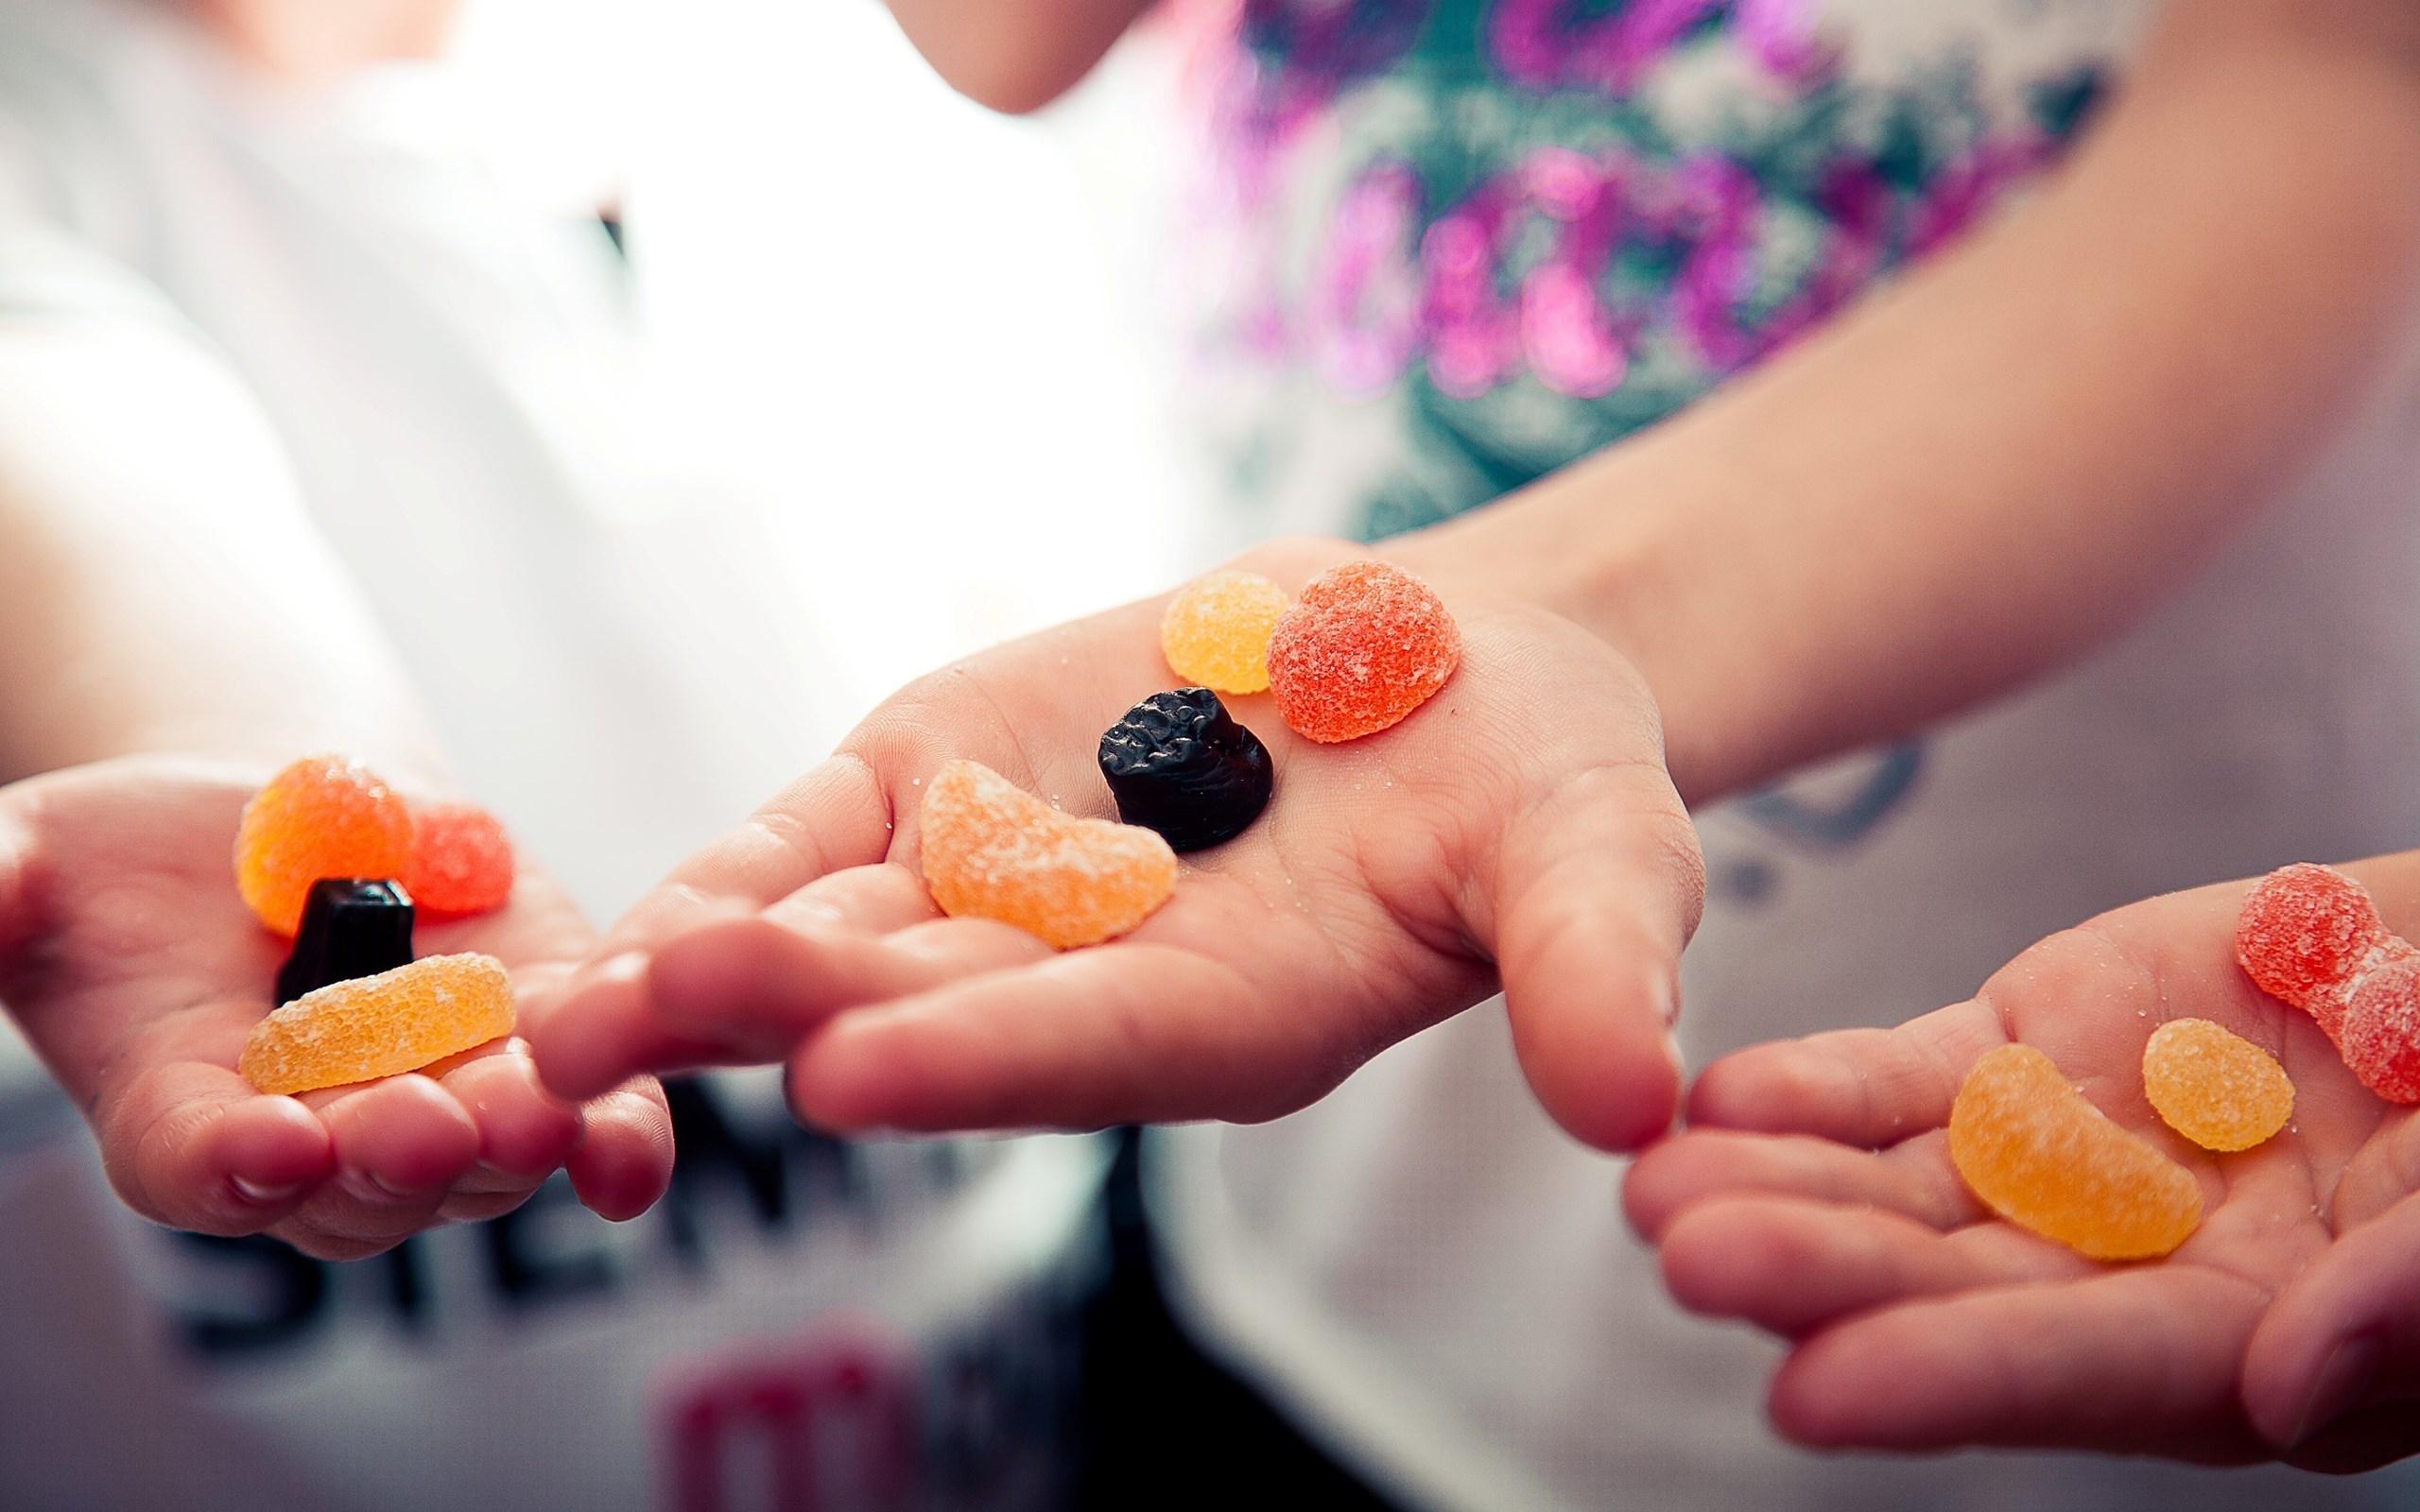 Kids Hands Fruit Jellies Focus HD Wallpaper